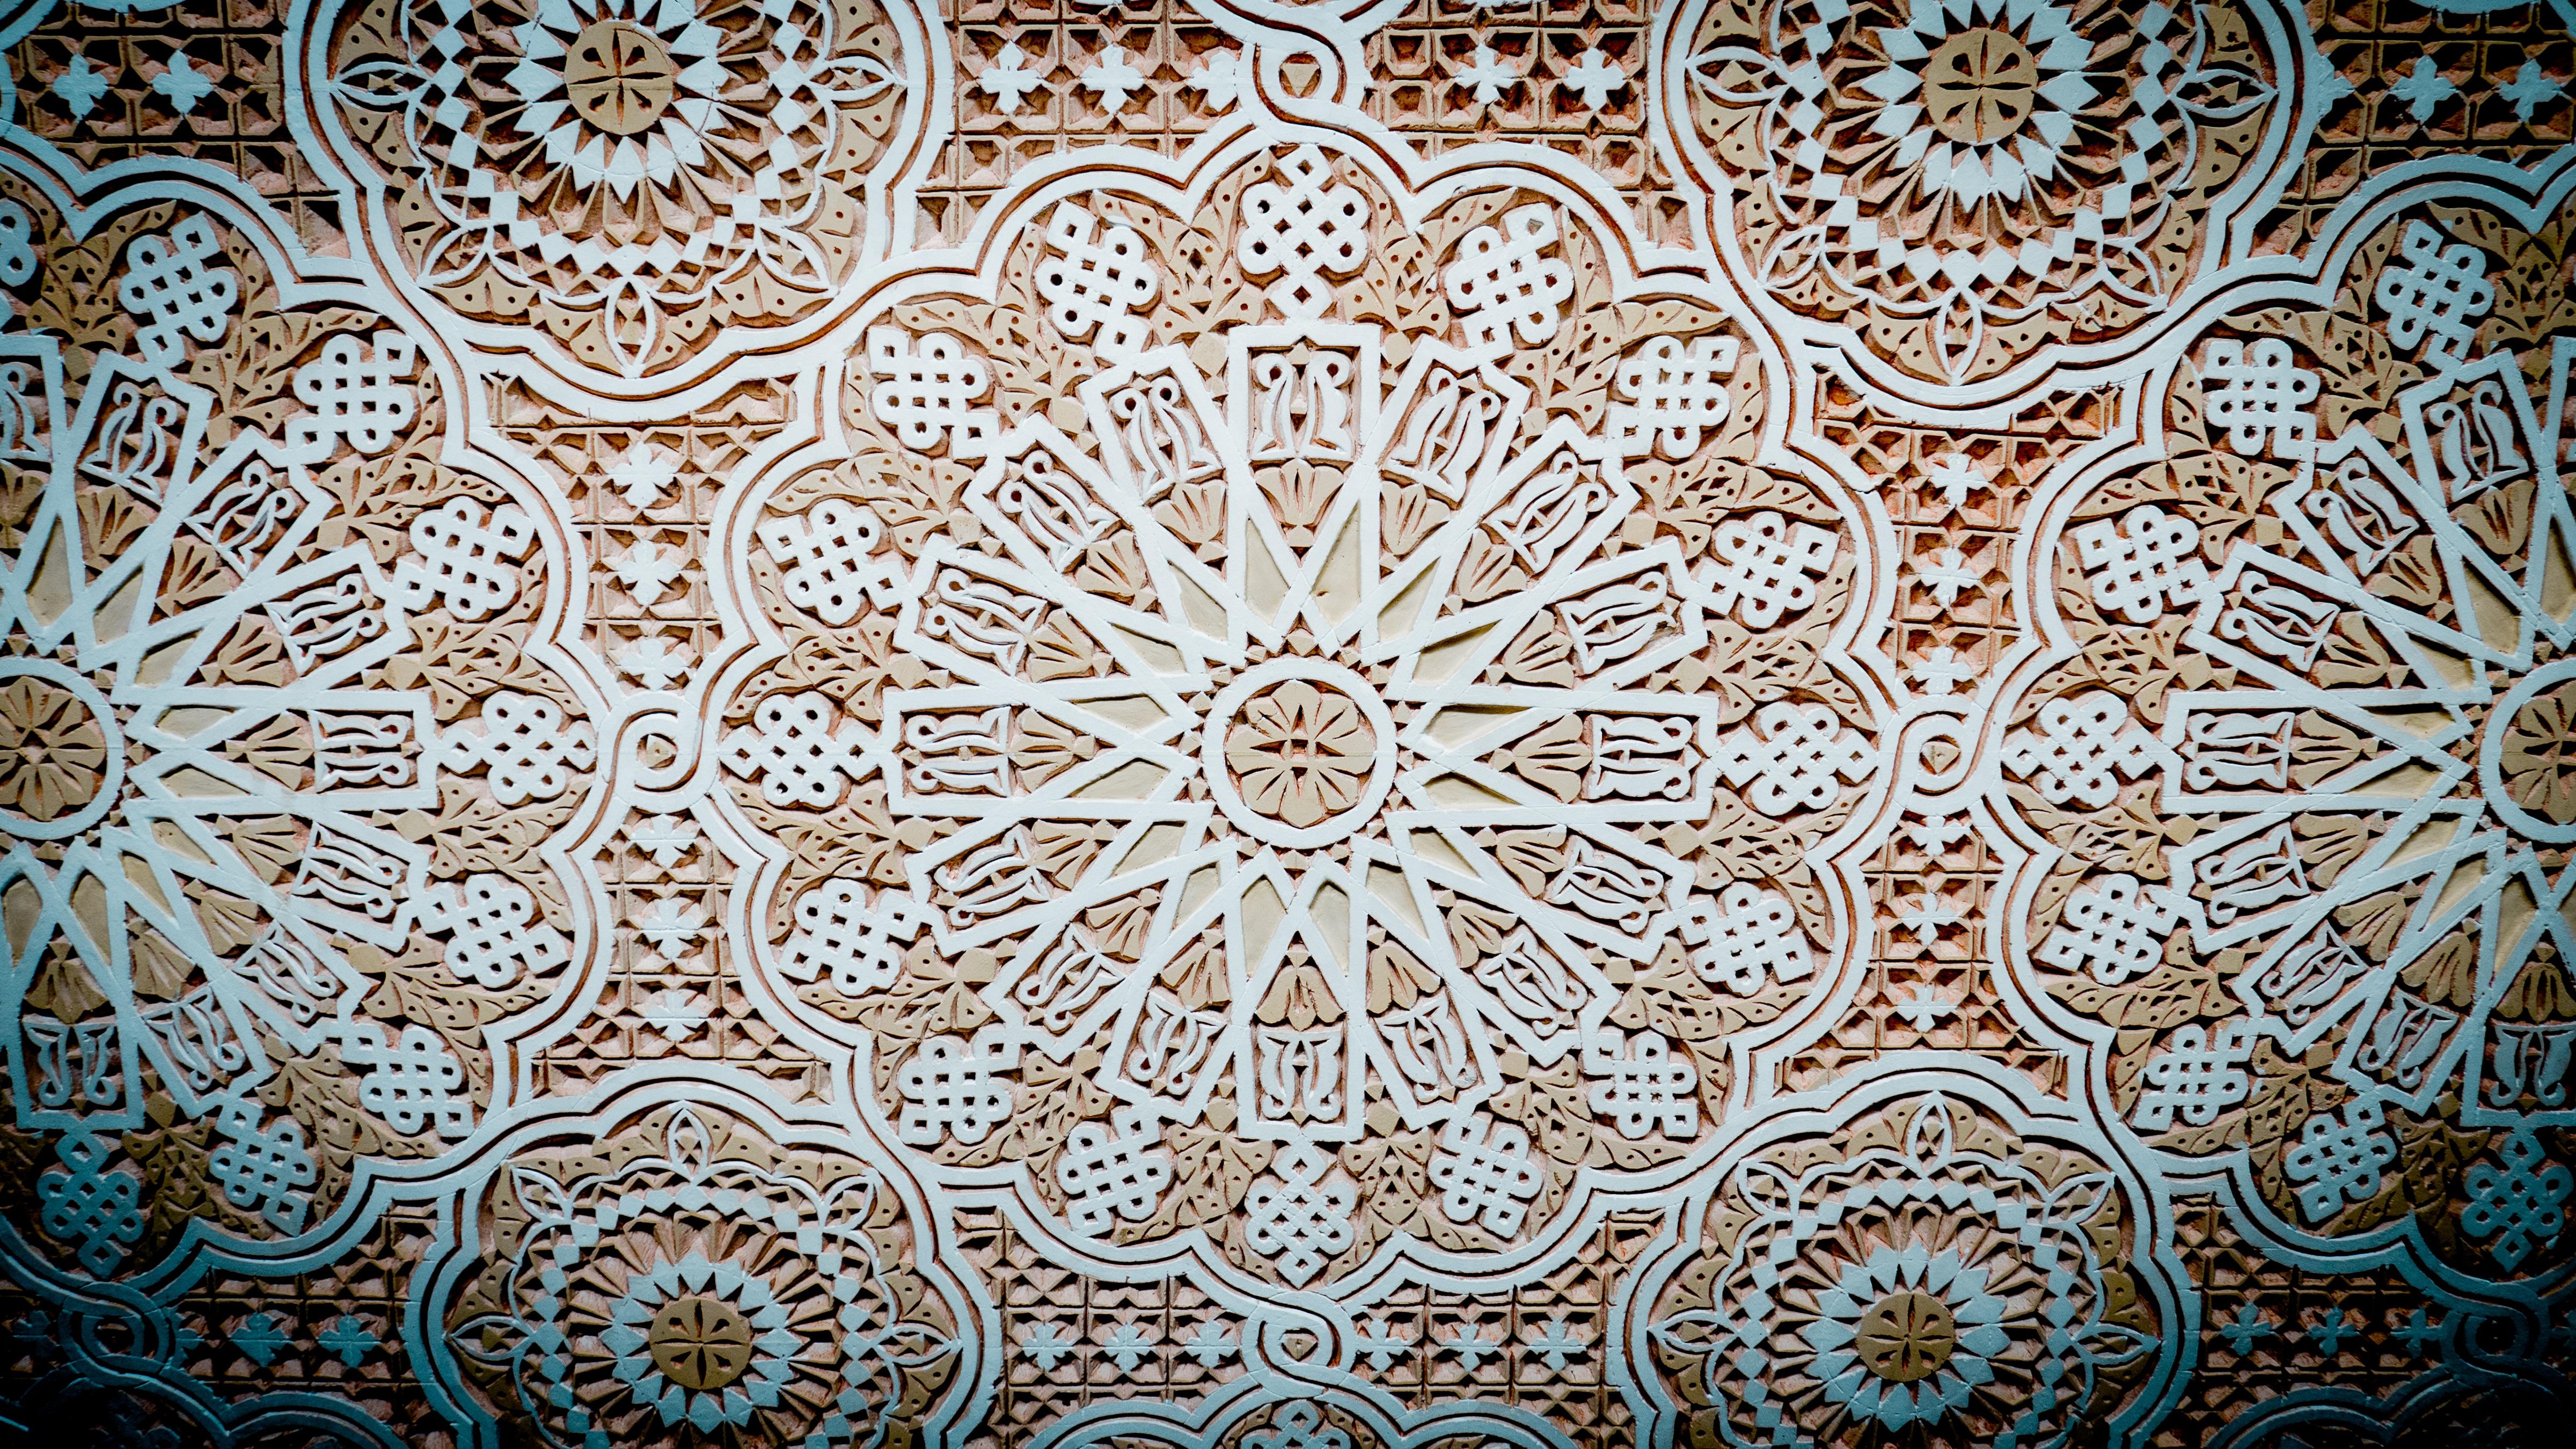 Free Images interior decoration pattern geometric